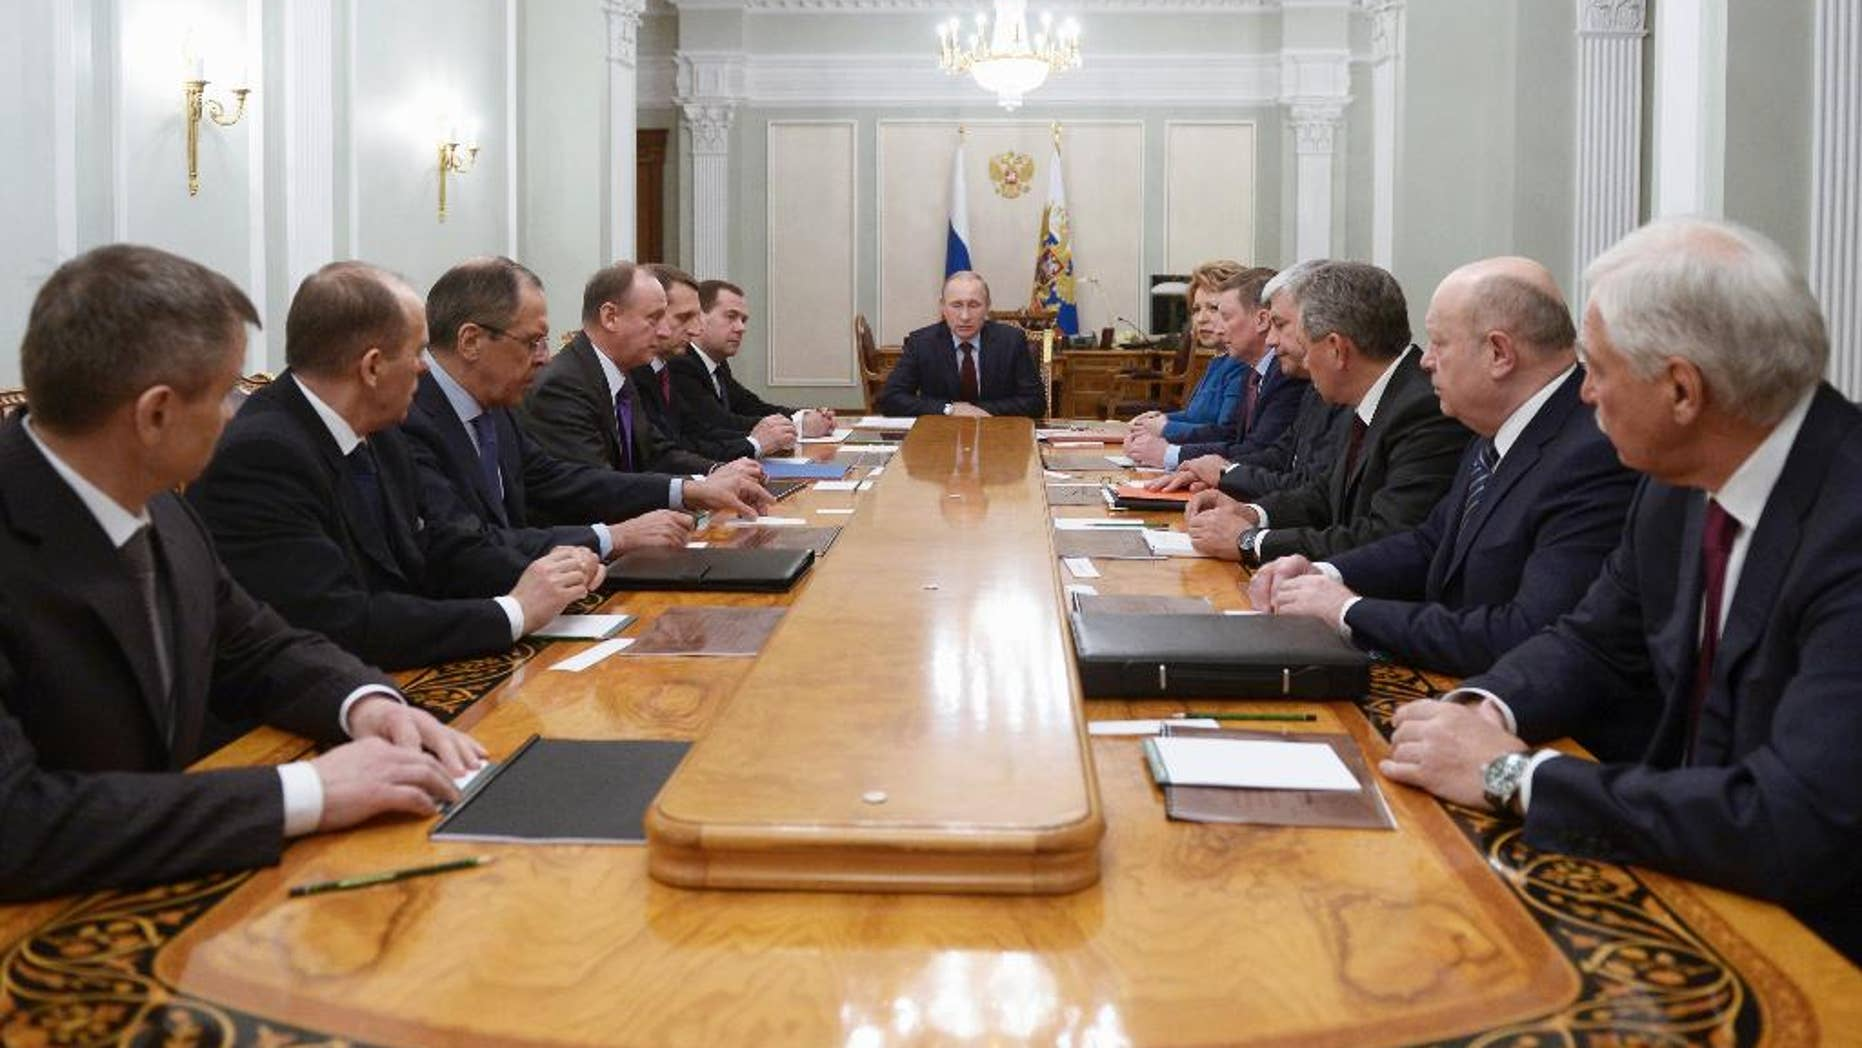 Russian President Vladimir Putin, center, chairs a Security Council meeting in the Novo-Ogaryovo residence outside Moscow, Russia, Friday, Jan. 30, 2015. (AP Photo/RIA-Novosti, Alexei Nikolsky, Presidential Press Service)